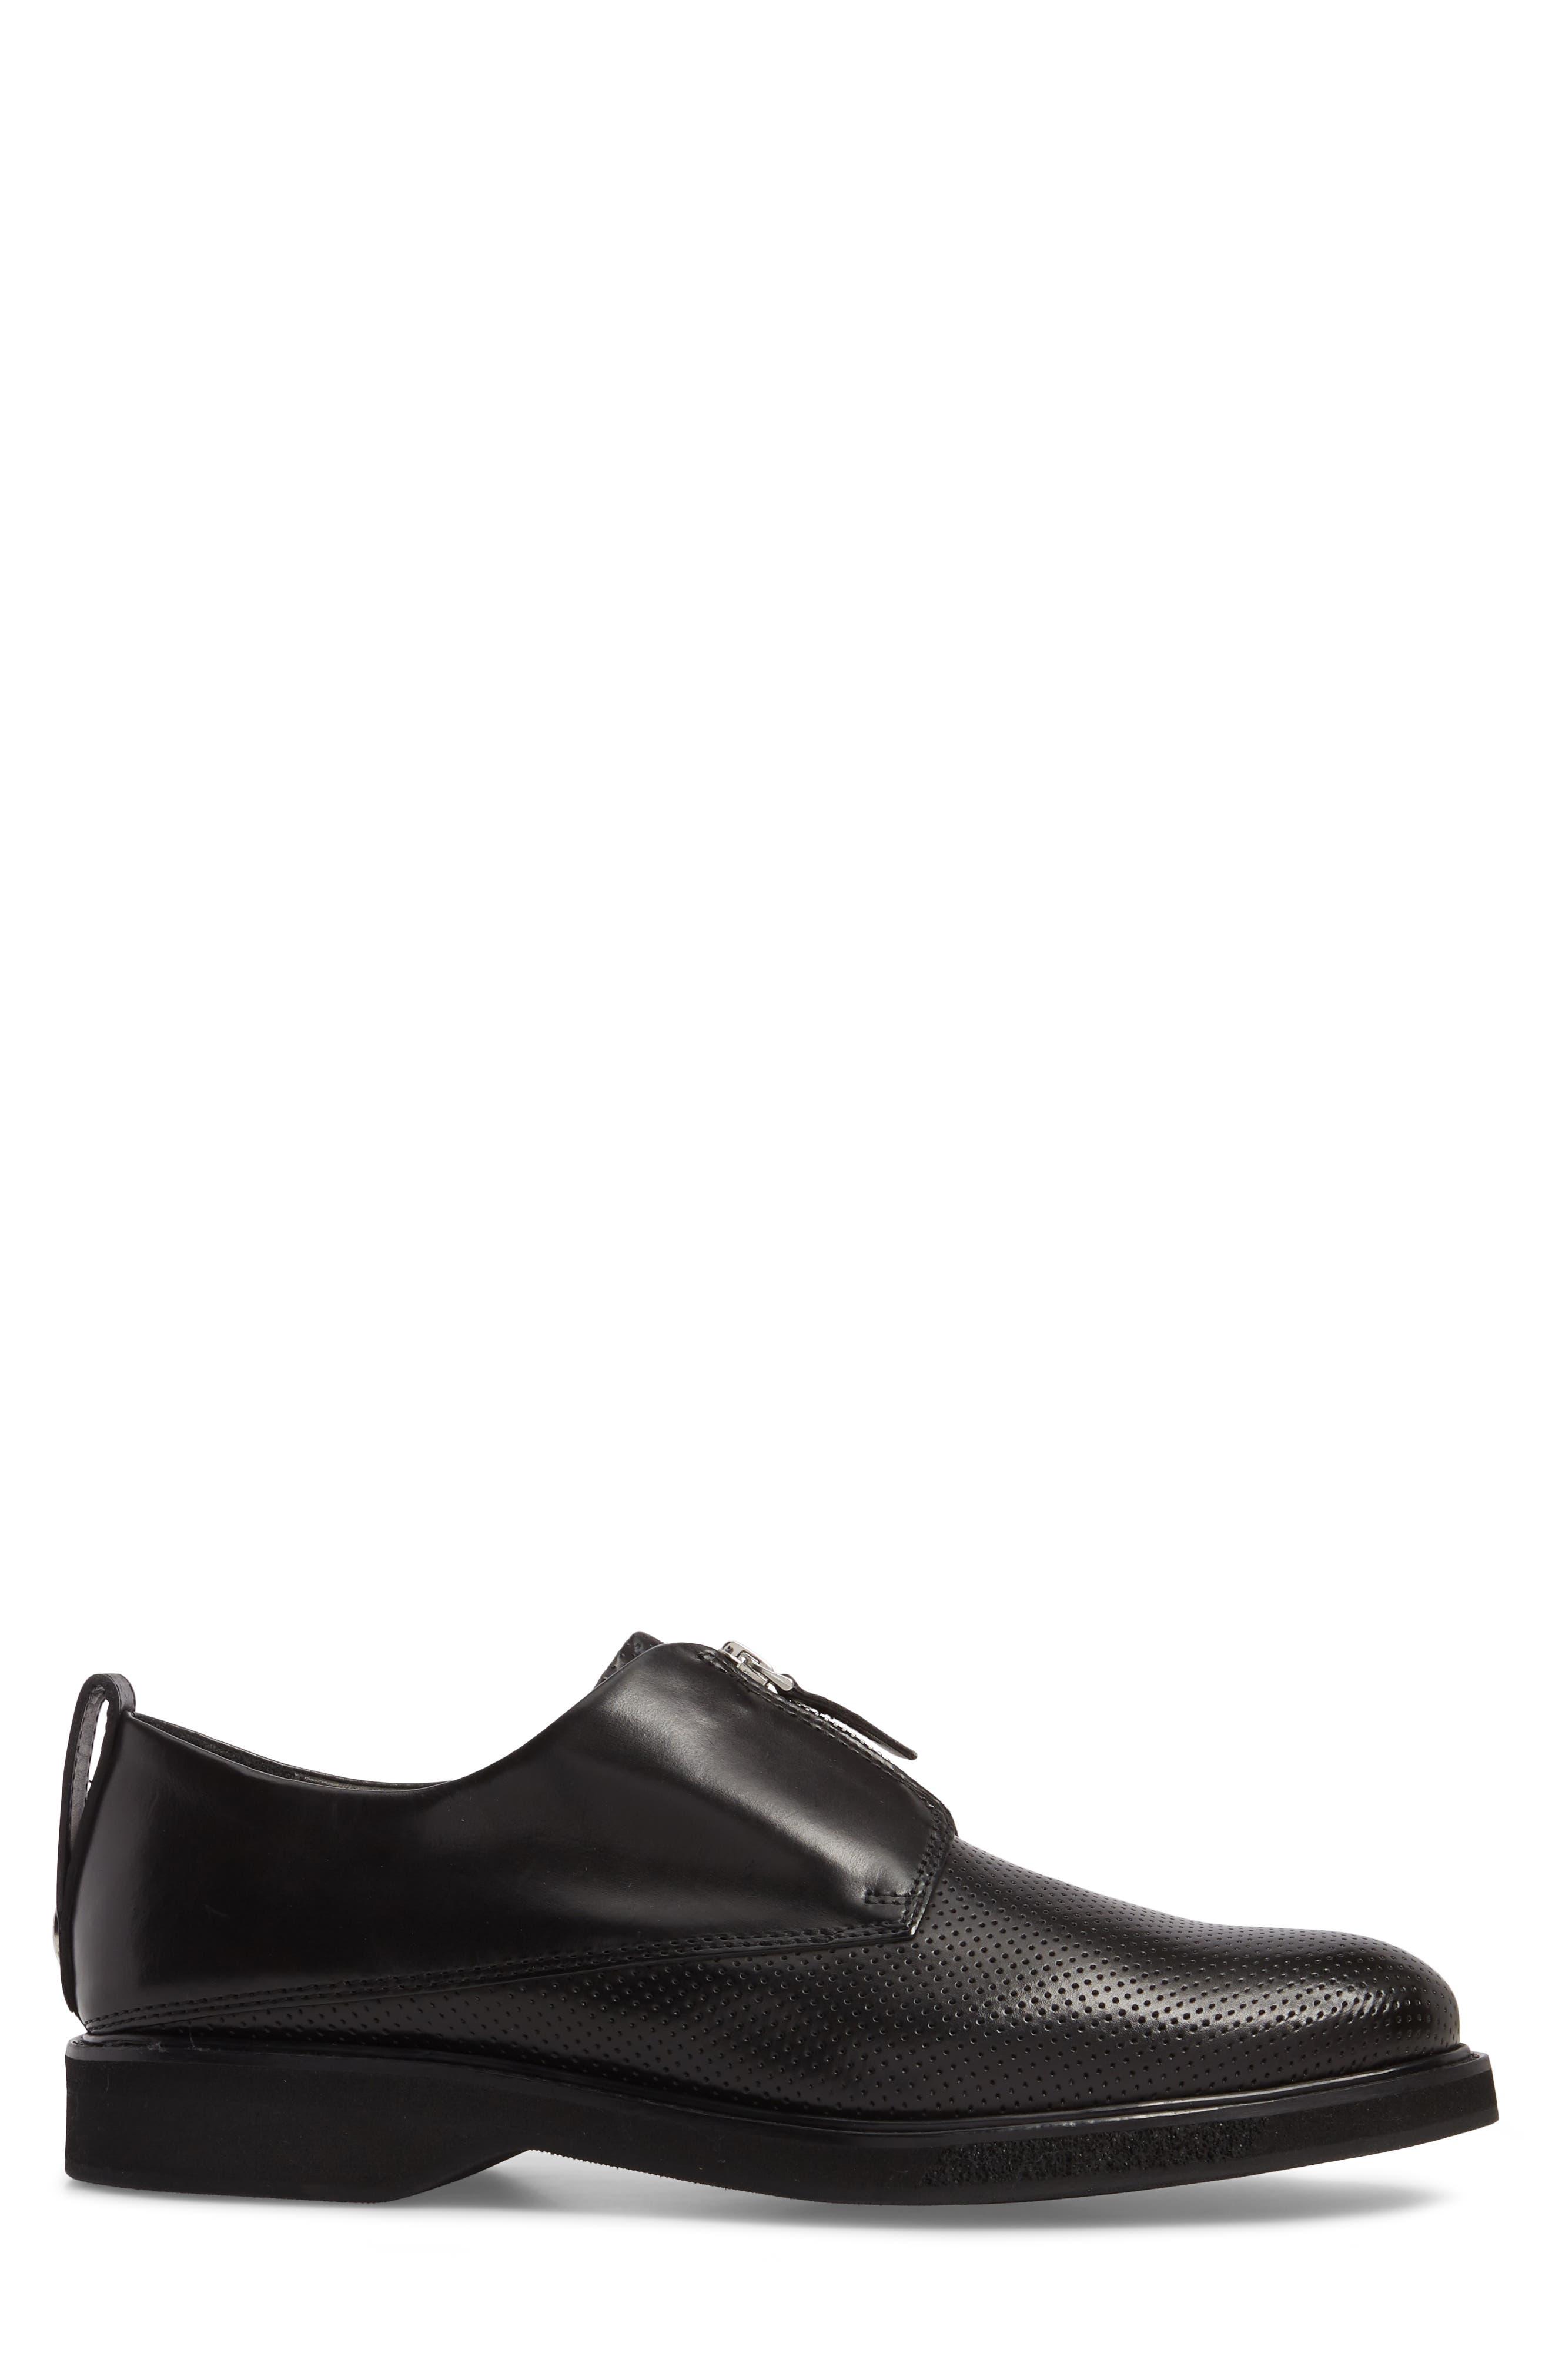 Zipped Derby Shoe,                             Alternate thumbnail 3, color,                             Multi Perforated Black/ Black